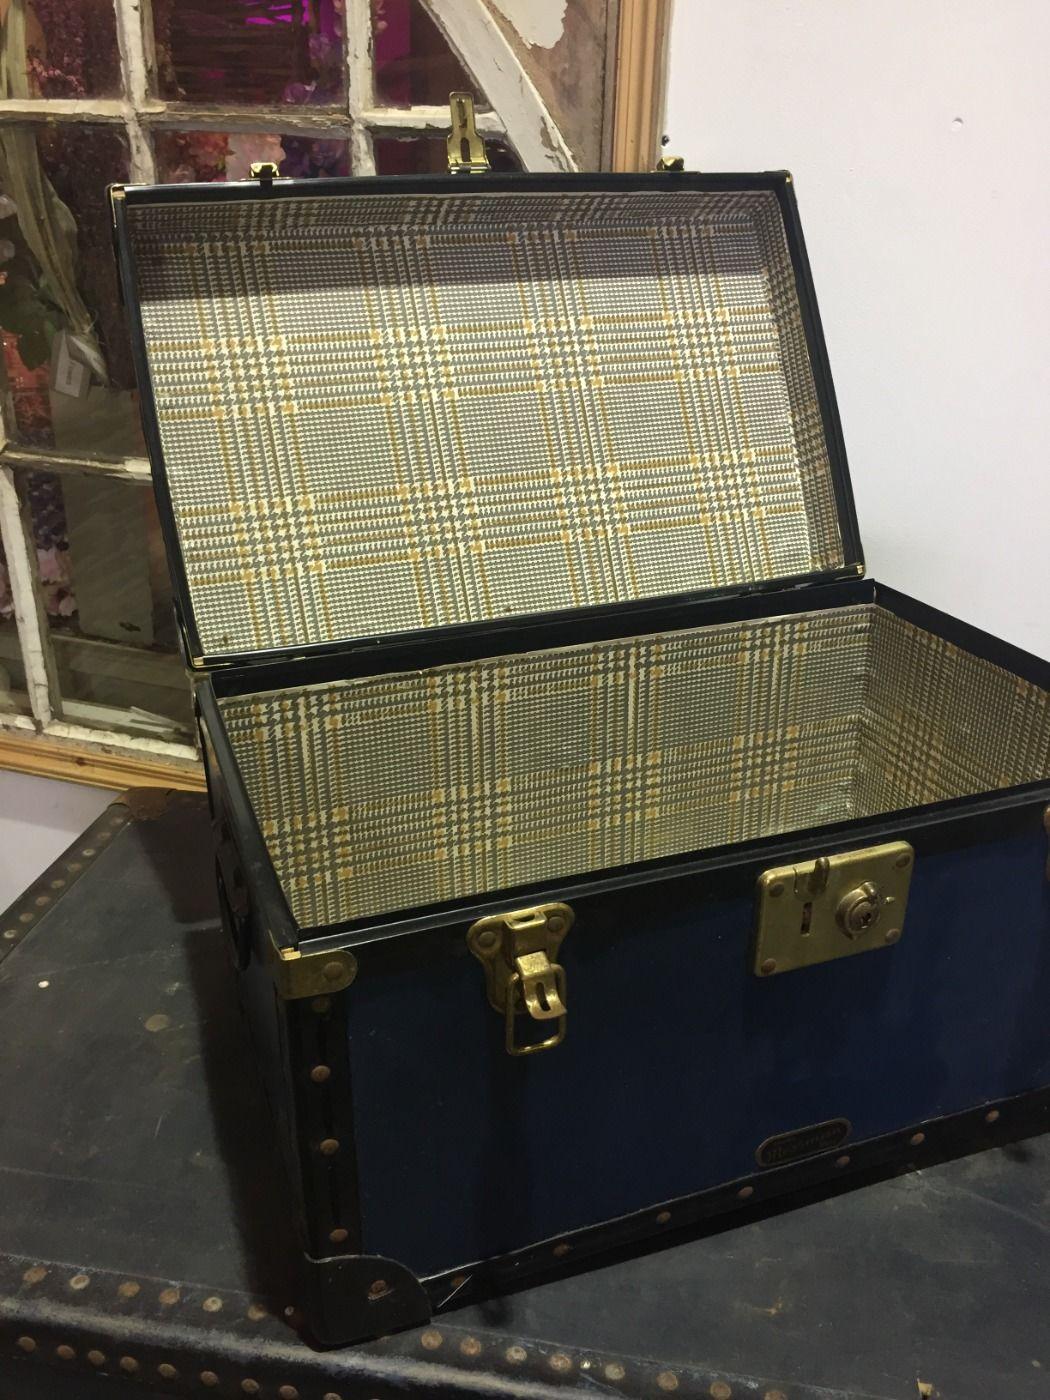 Steamer chest - www.Brandonthatchers.co.uk